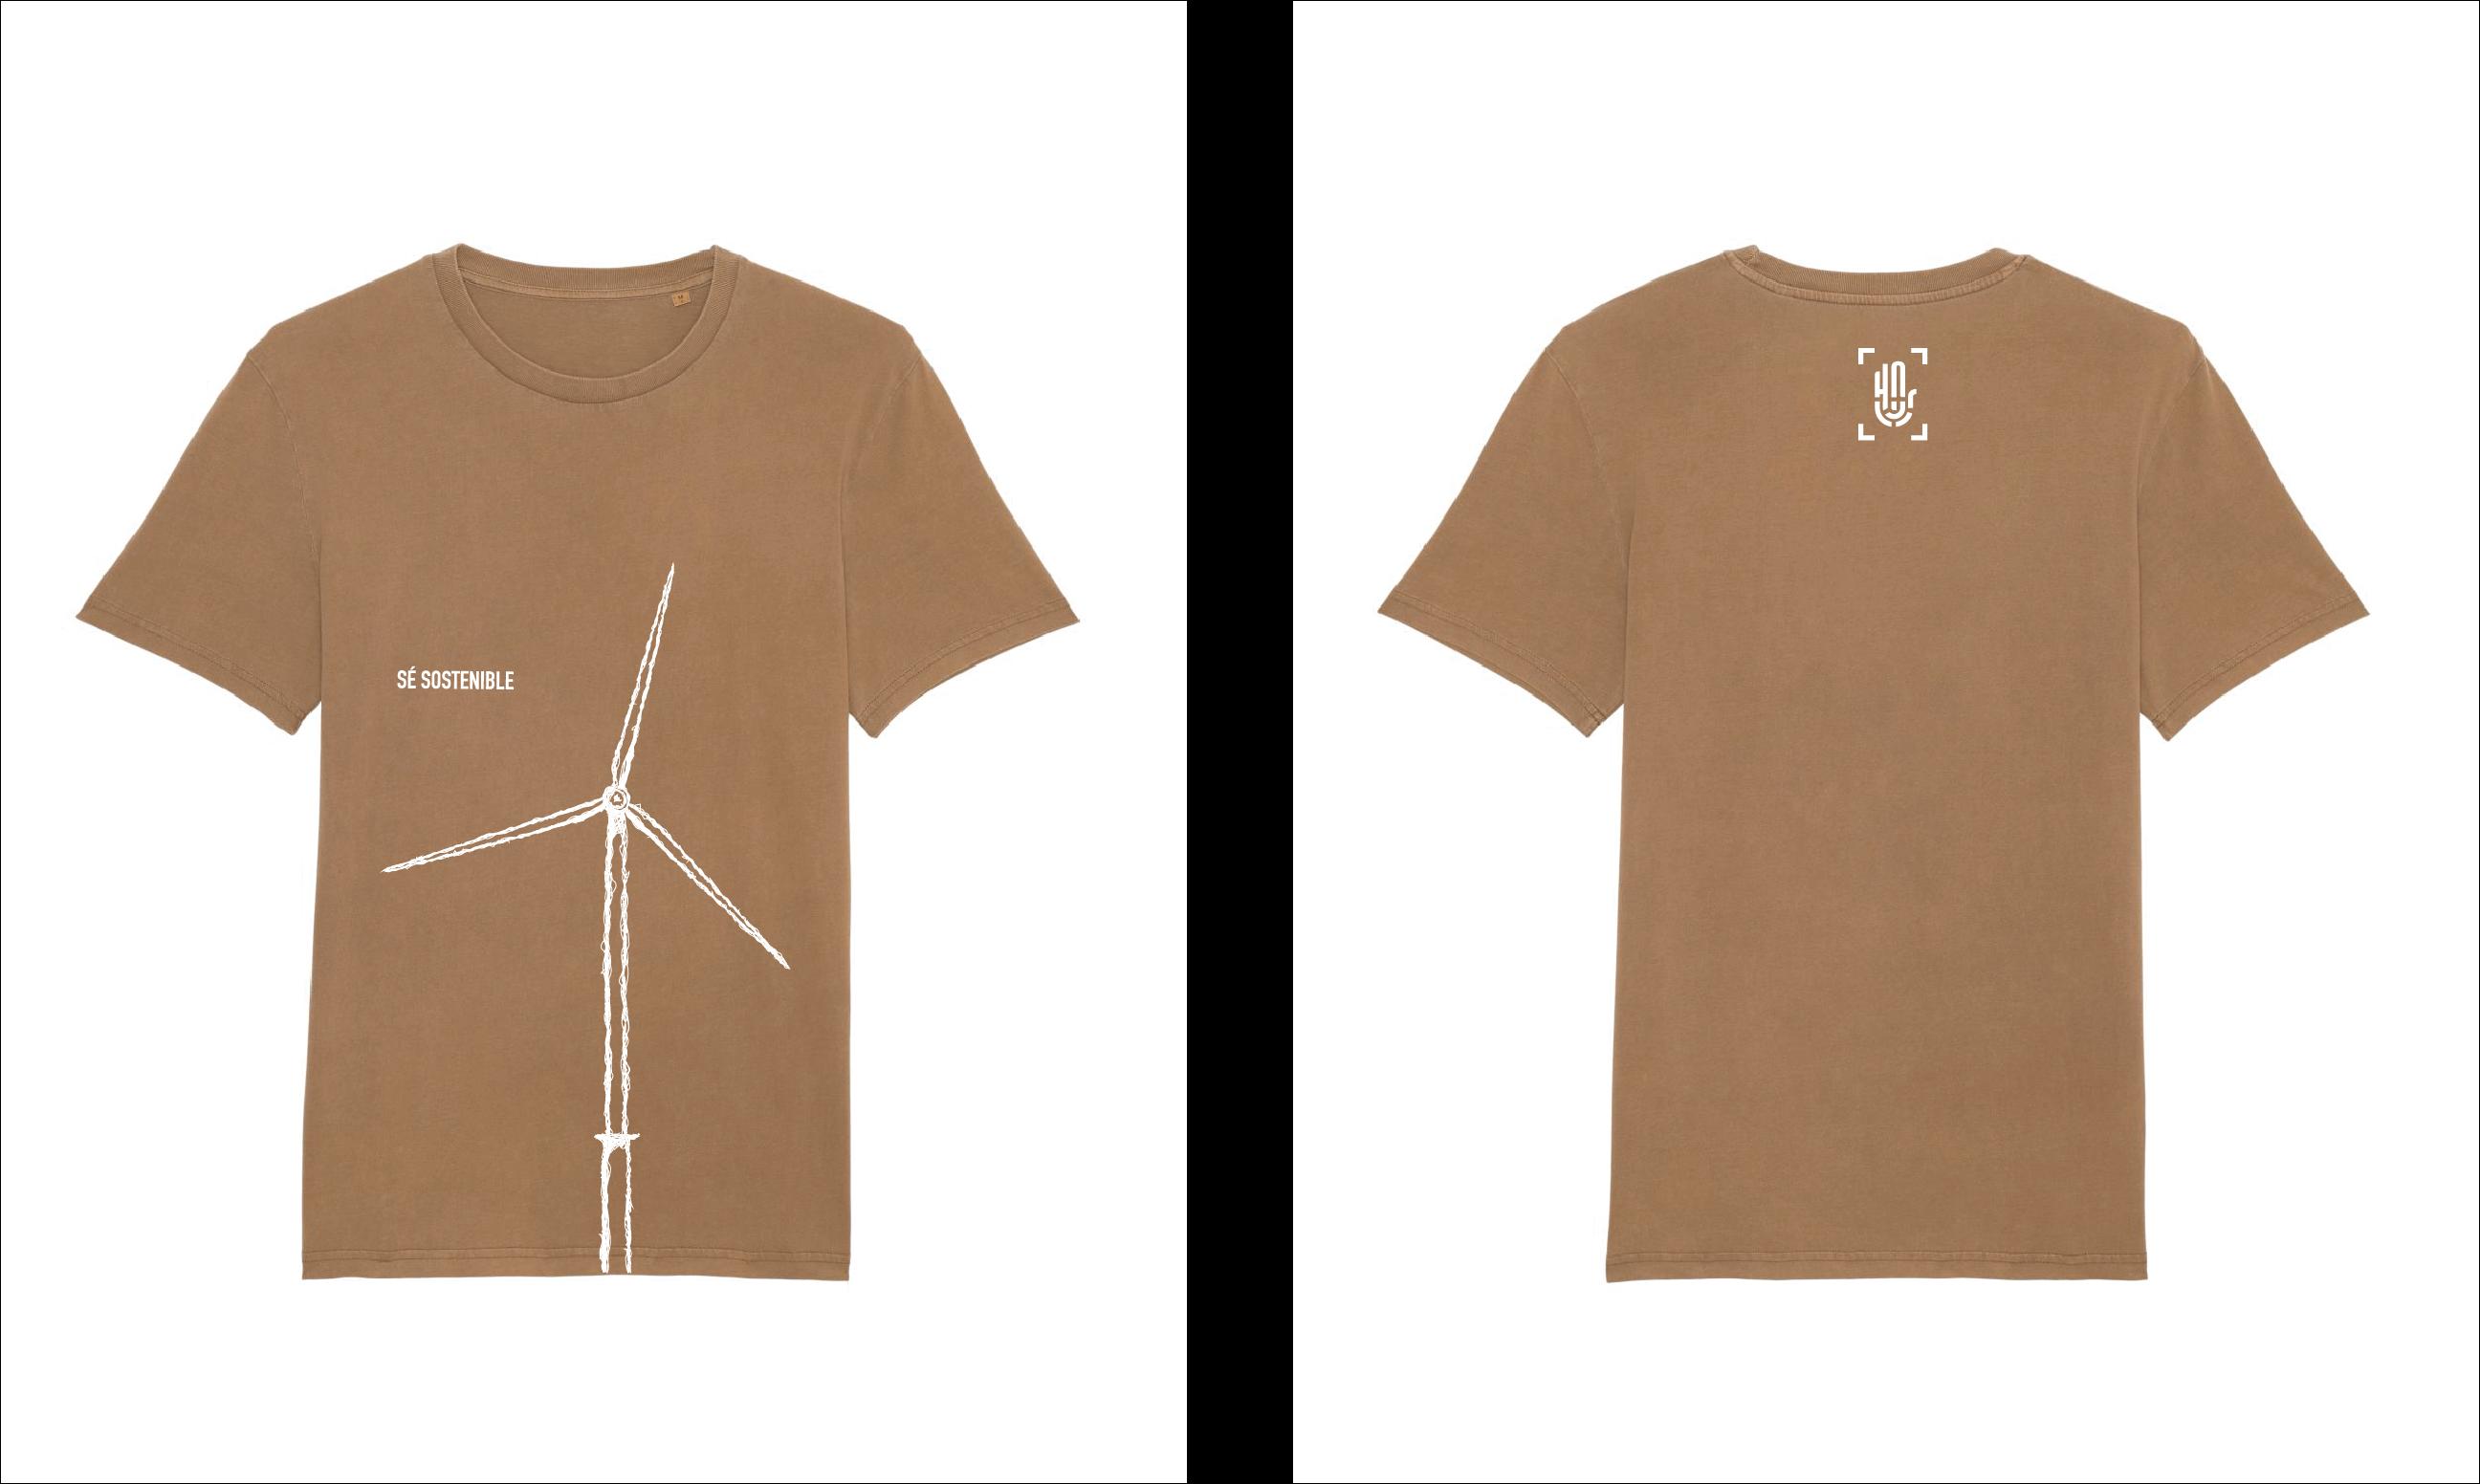 Camiseta Creator Vintage HNR003-Dyed Caramel